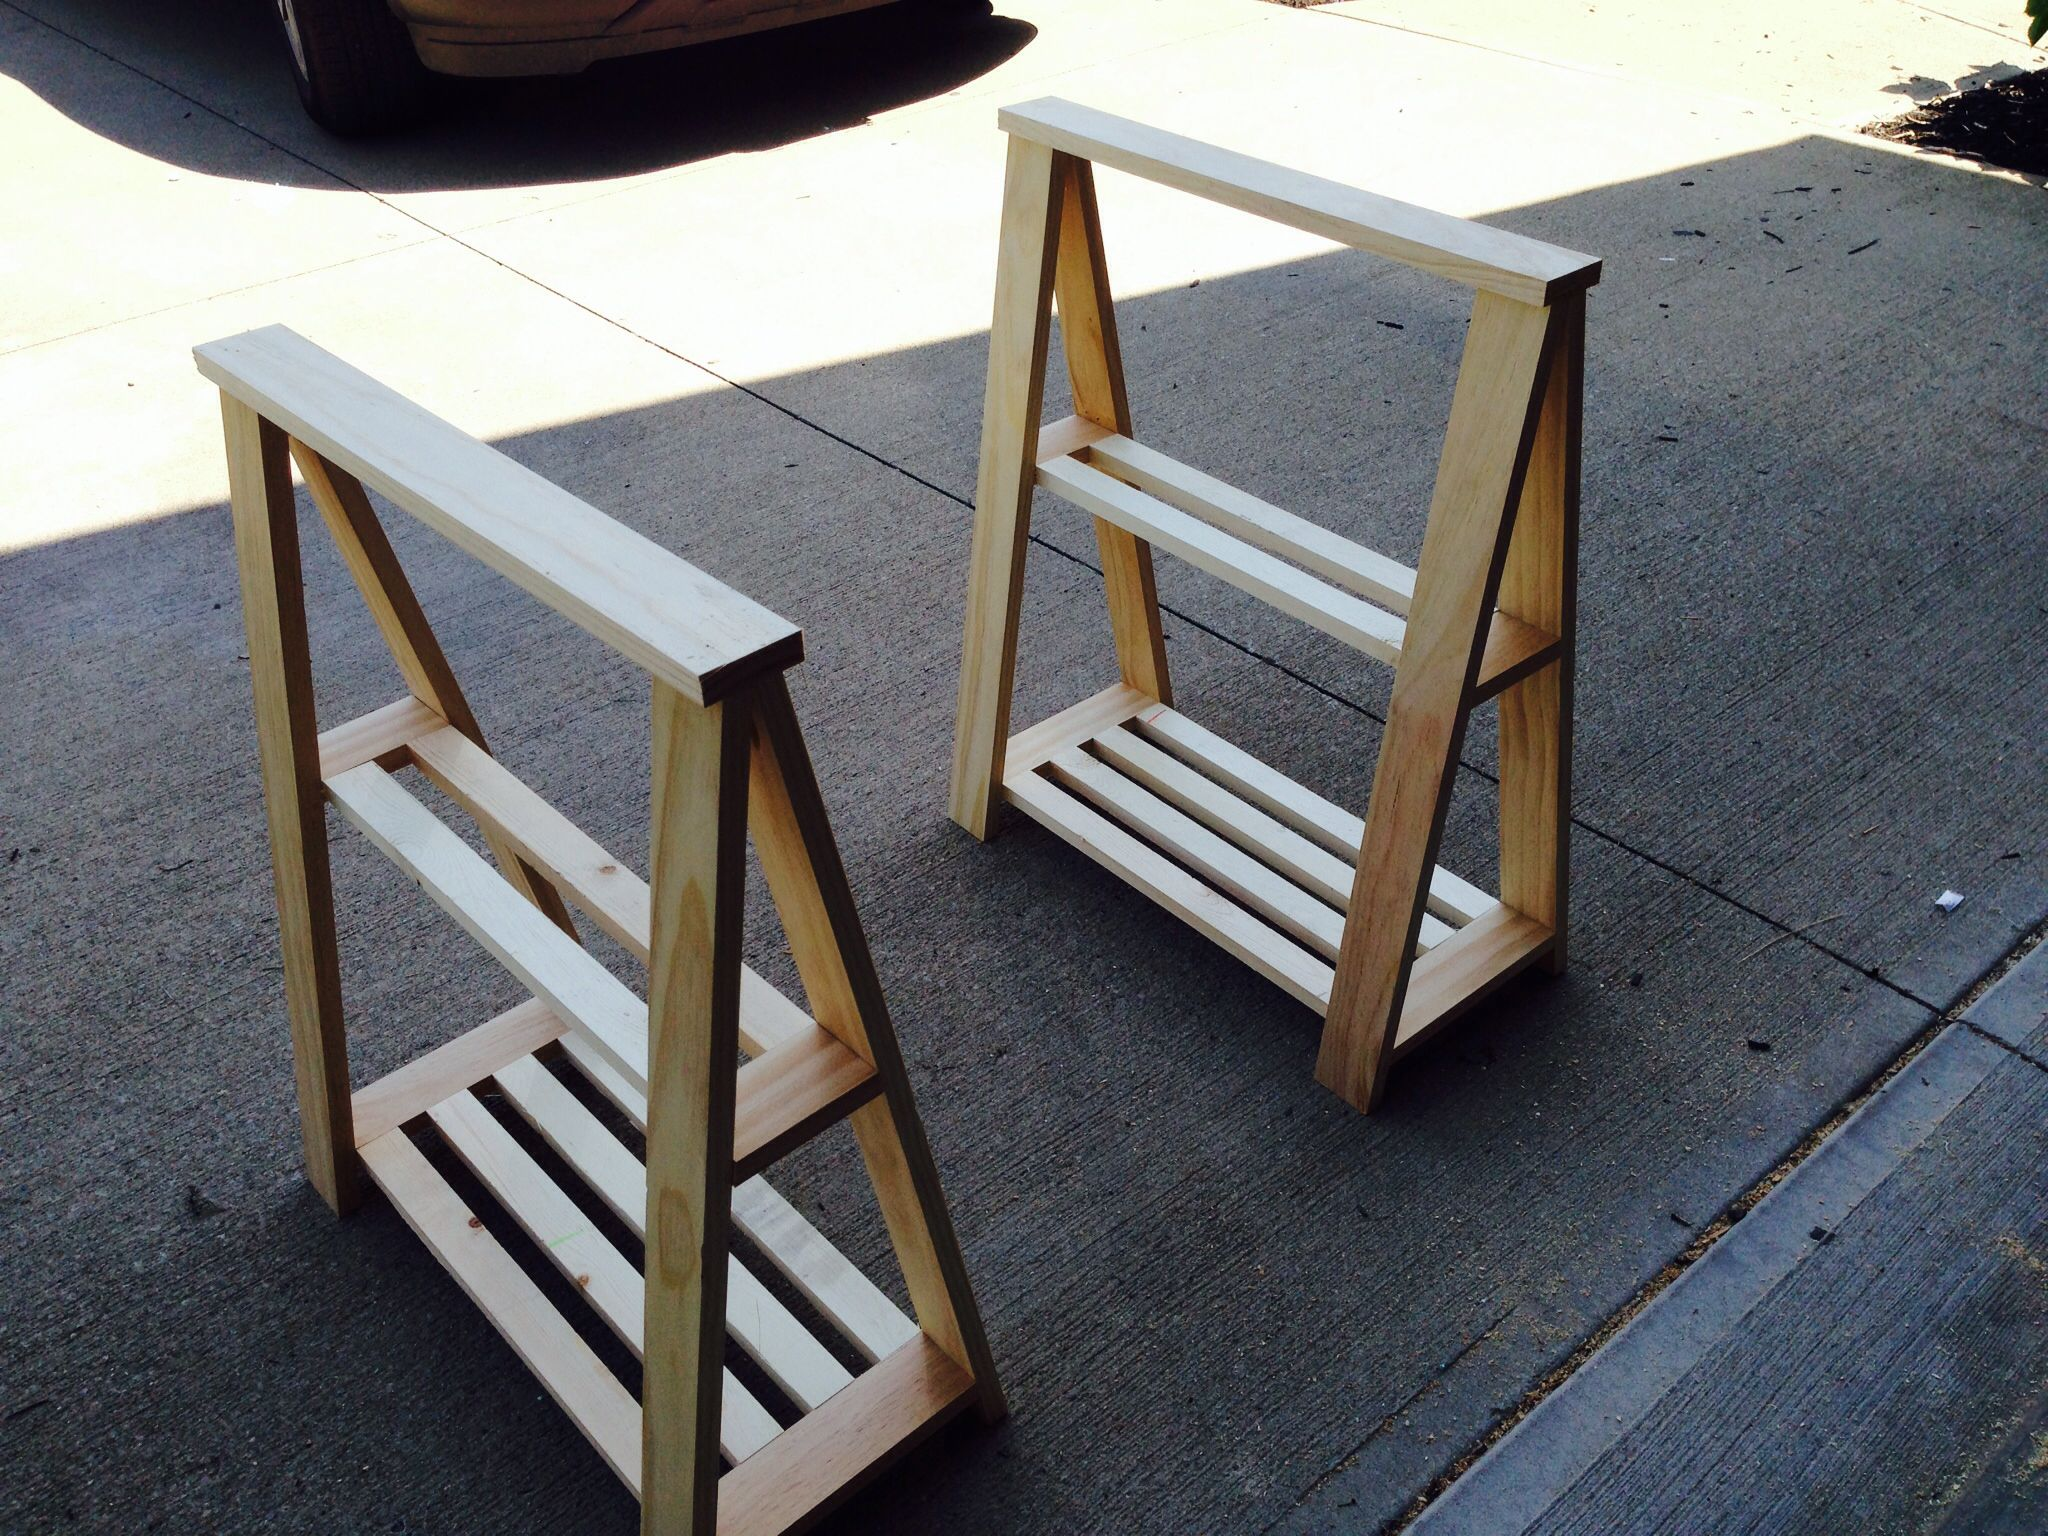 DIY Sawhorse Table legs (unfinished) Diy furniture